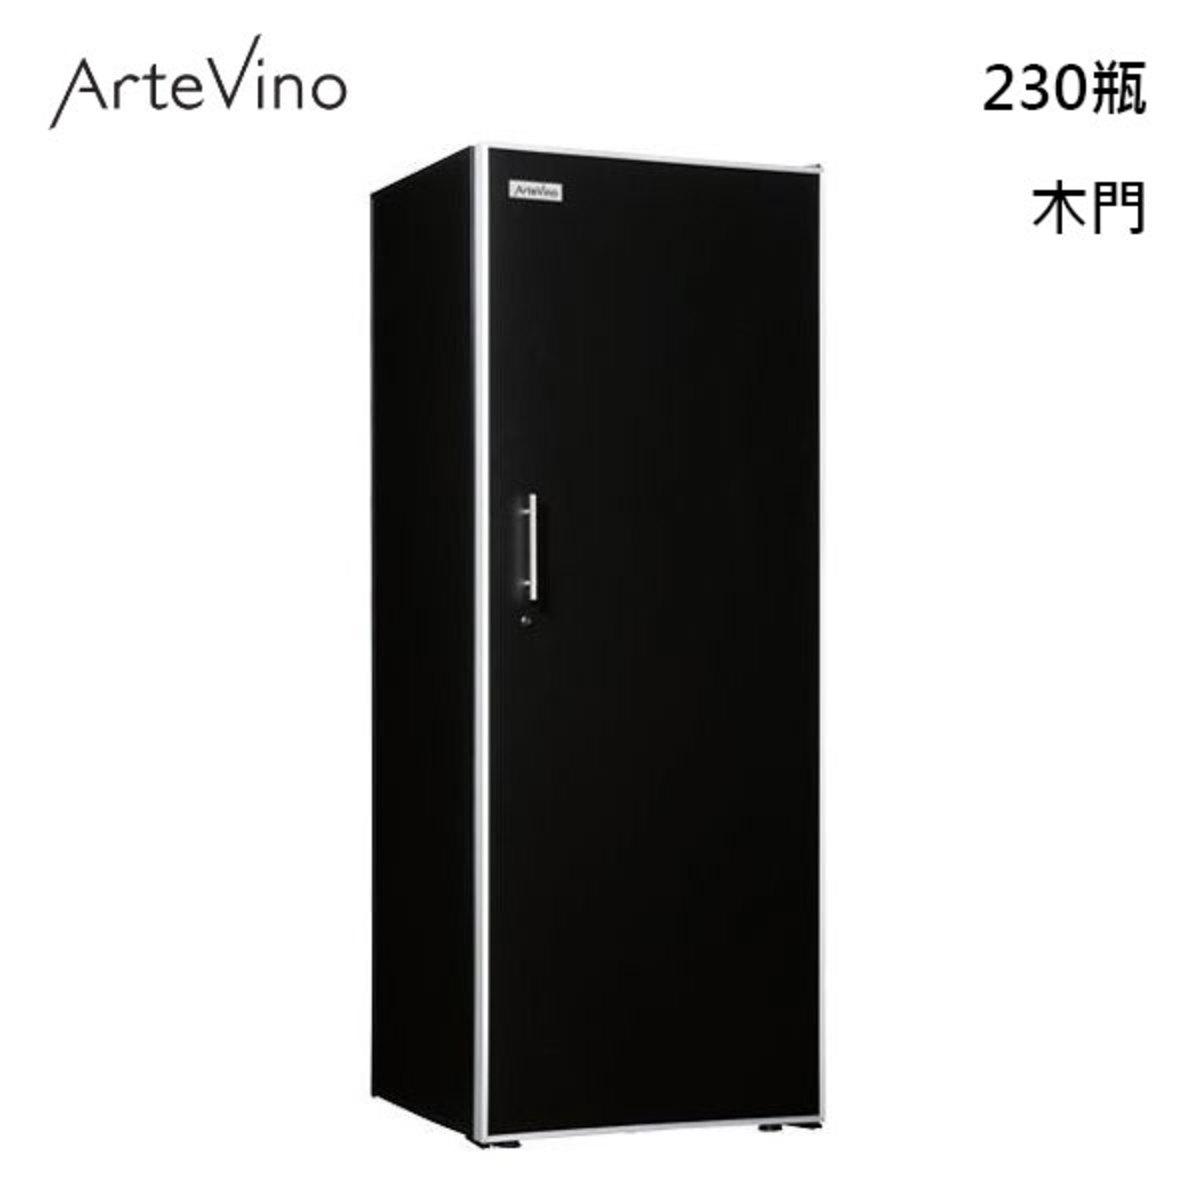 Artevino OXGIT230NPD 單溫 木門酒櫃 230瓶